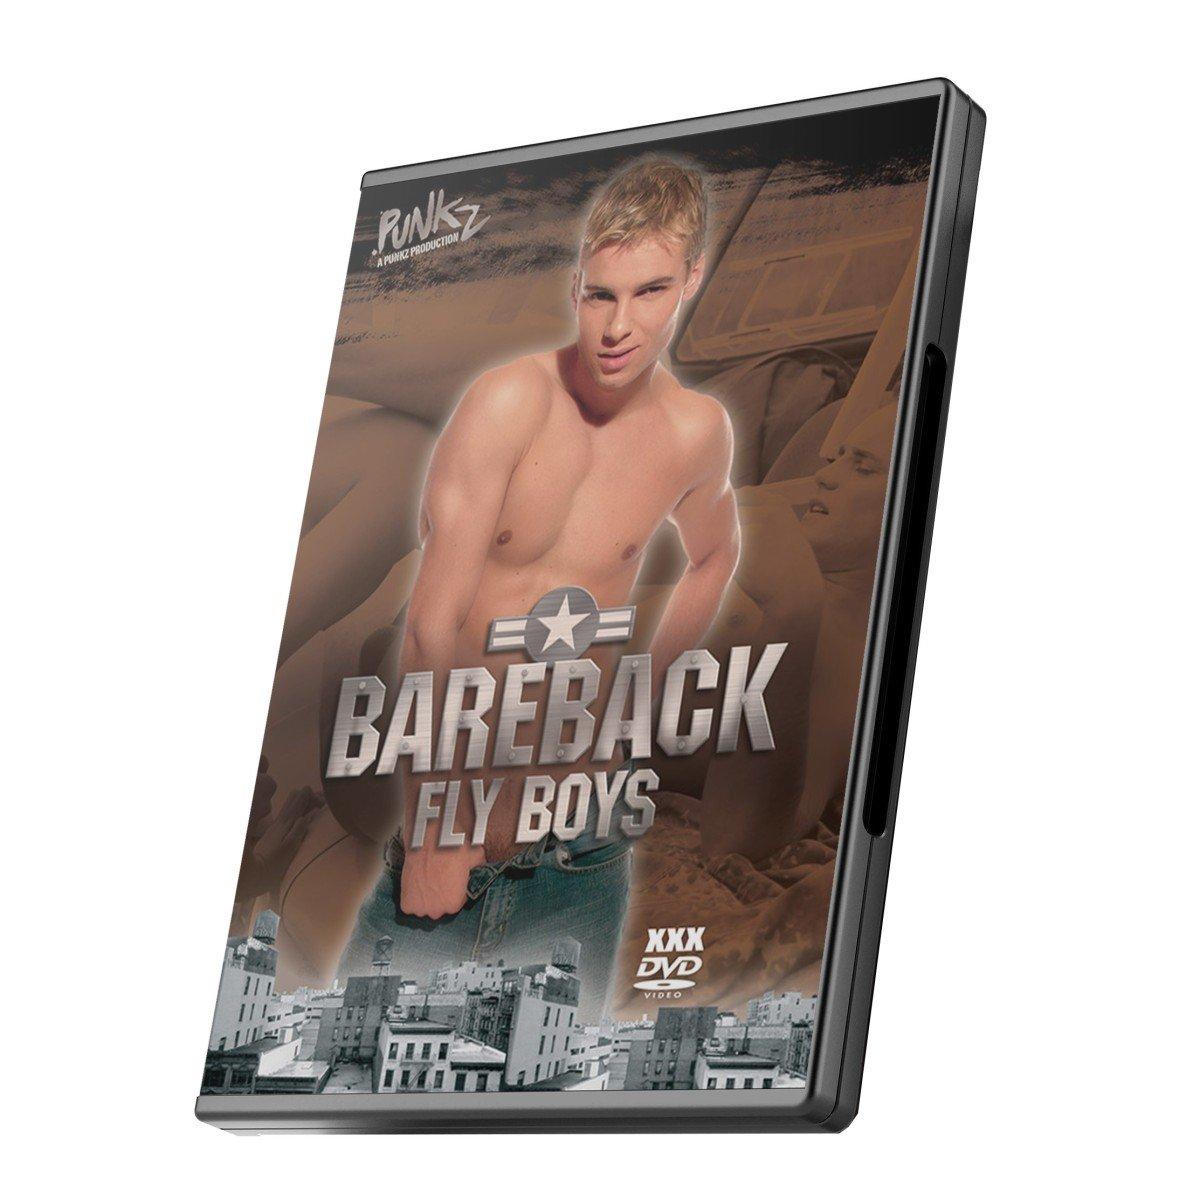 Punkz: Bareback Fly Boys